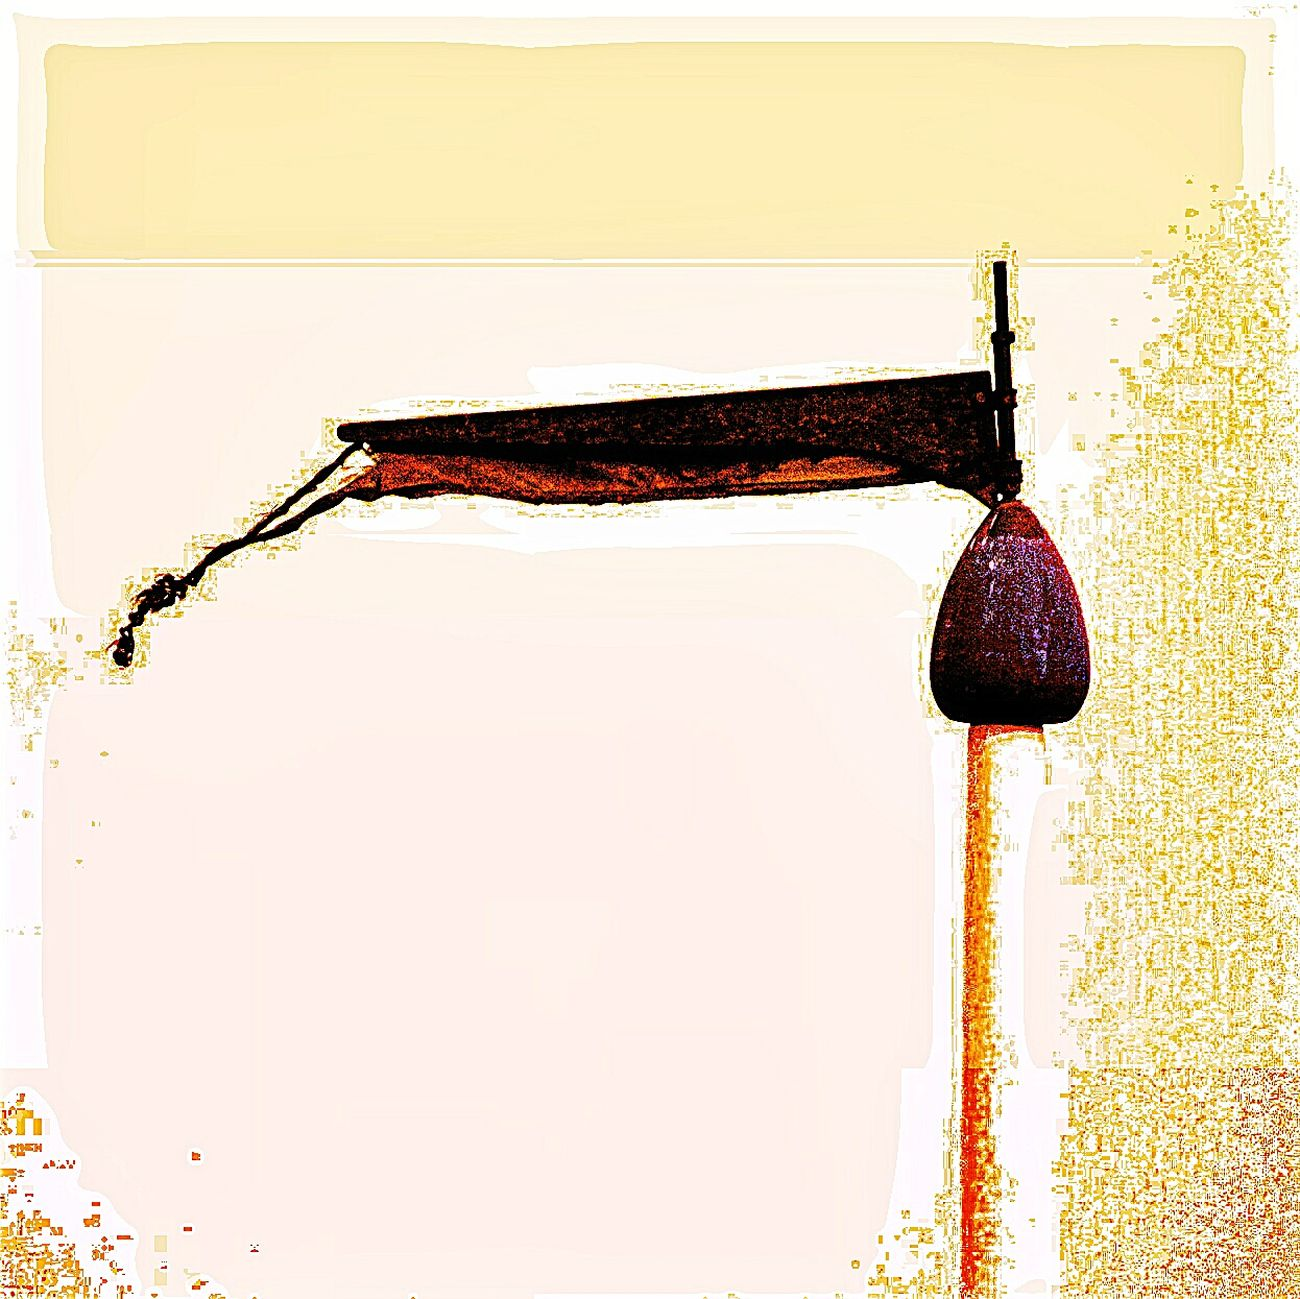 Ahoi Sailor Sailing EyeEm Gallery Openyourmind Check This Out Leer (Ostfriesland) The Week Of Eyeem Have A Nice Day♥ Urban Exploration Tadaa Community Hello World EyeEm Team EyeEm Ihaveadream Eyeemlove Taking Photos EyeEm Best Edits Ostfriesland